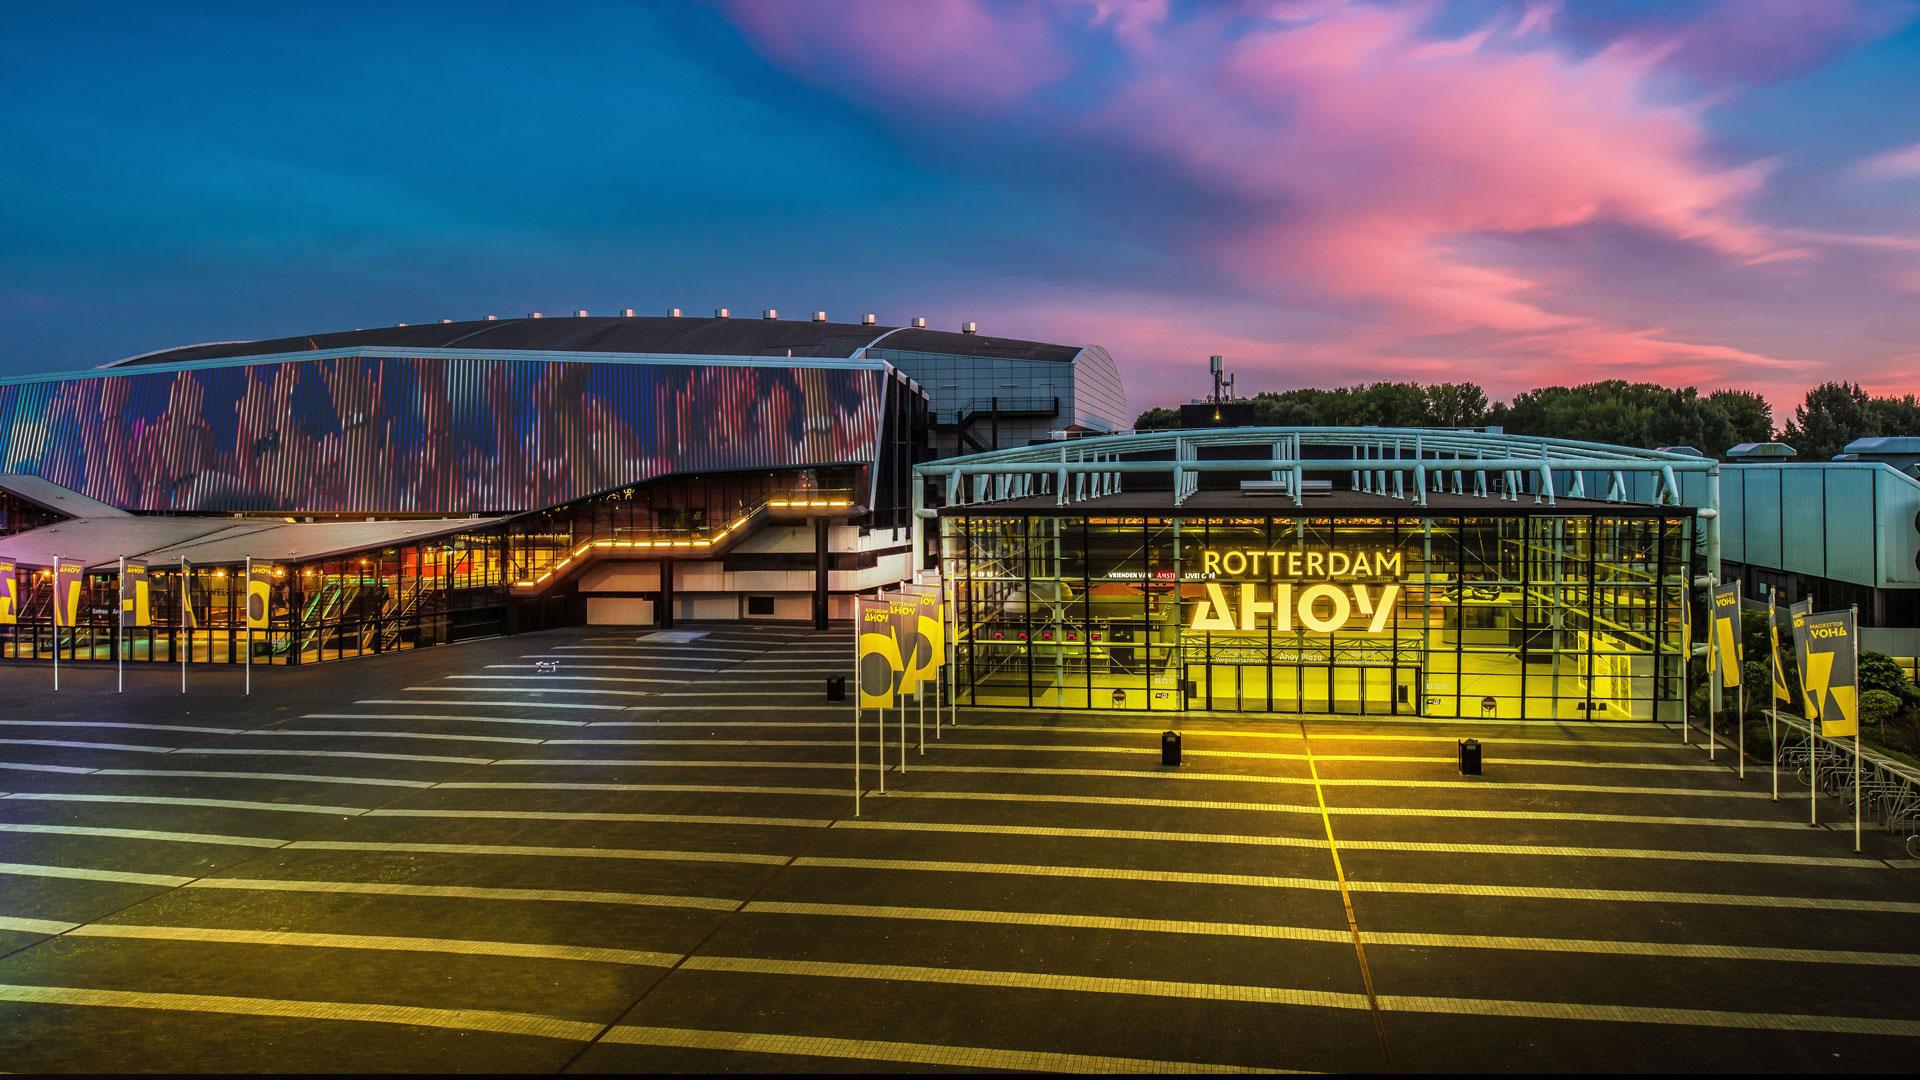 Rotterdam Ahoy Arena, luogo dell'evento